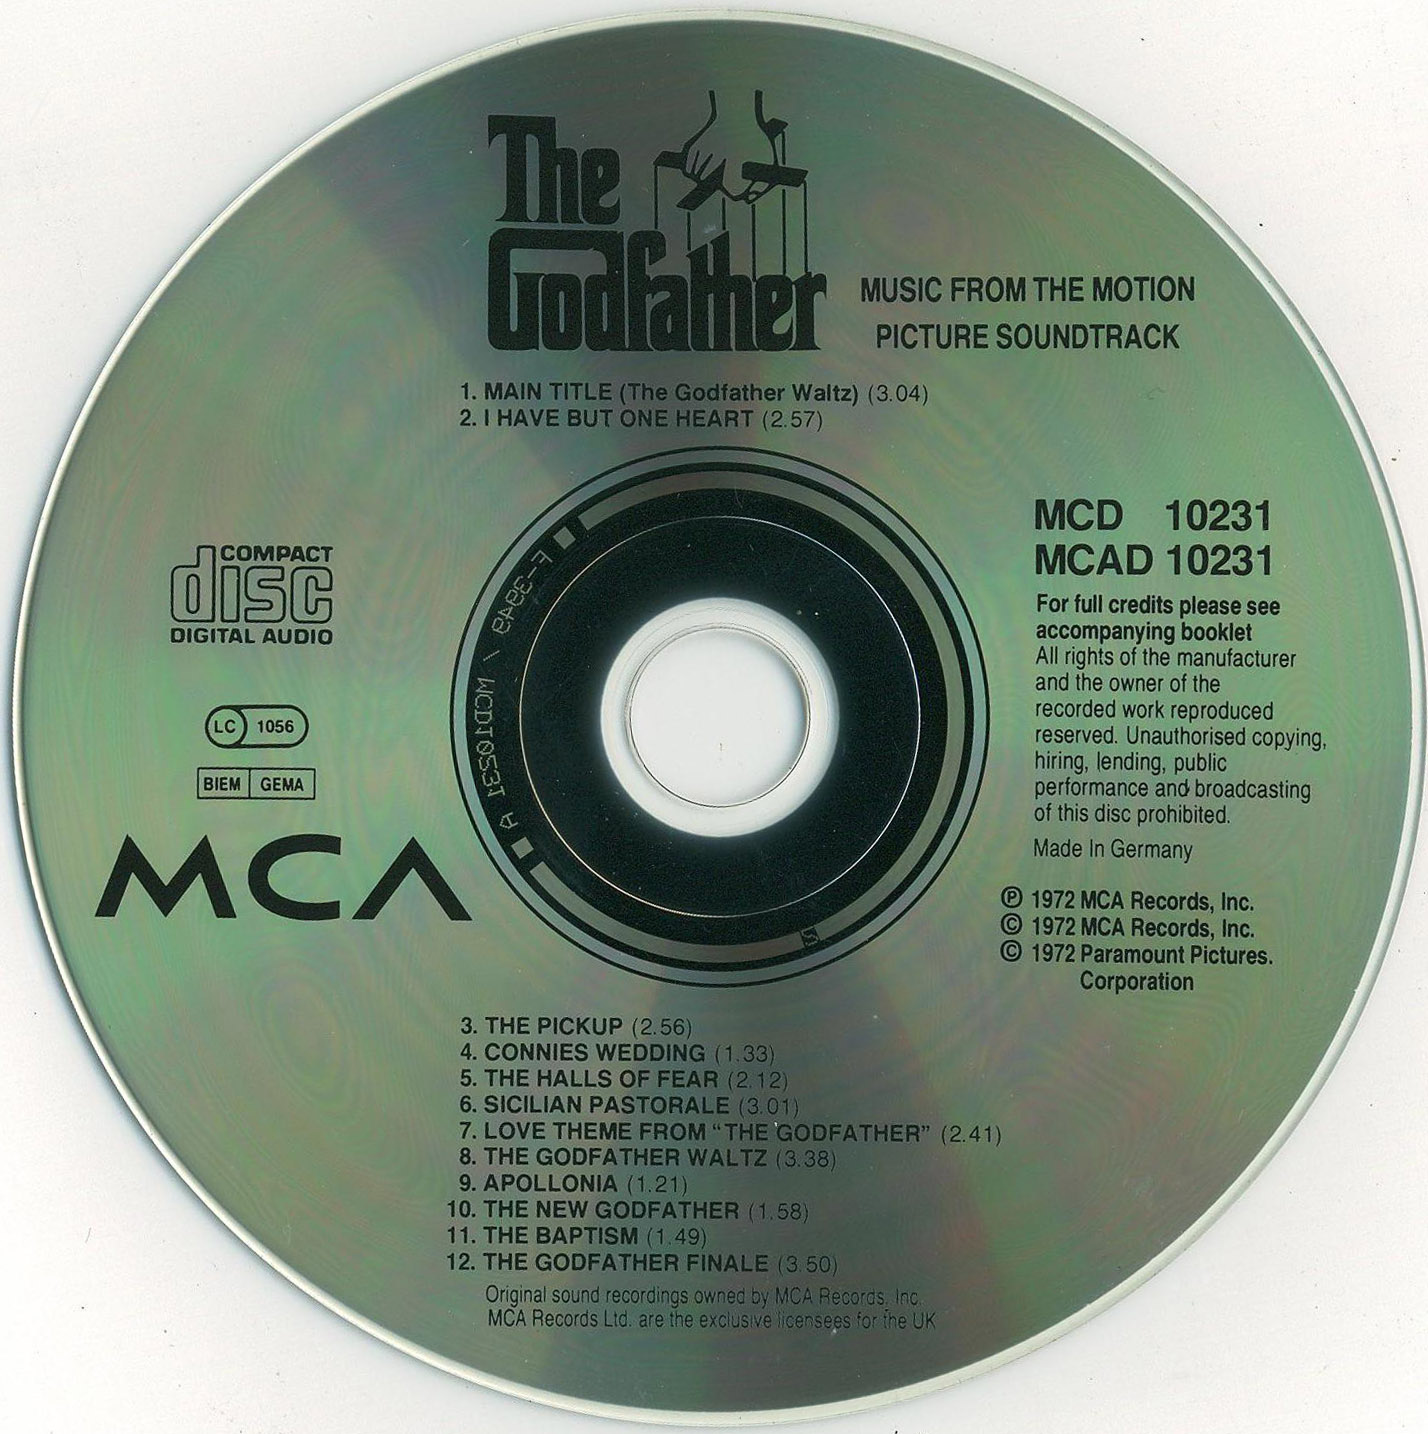 Nino Rota The Godfather Part II Original Soundtrack Recording